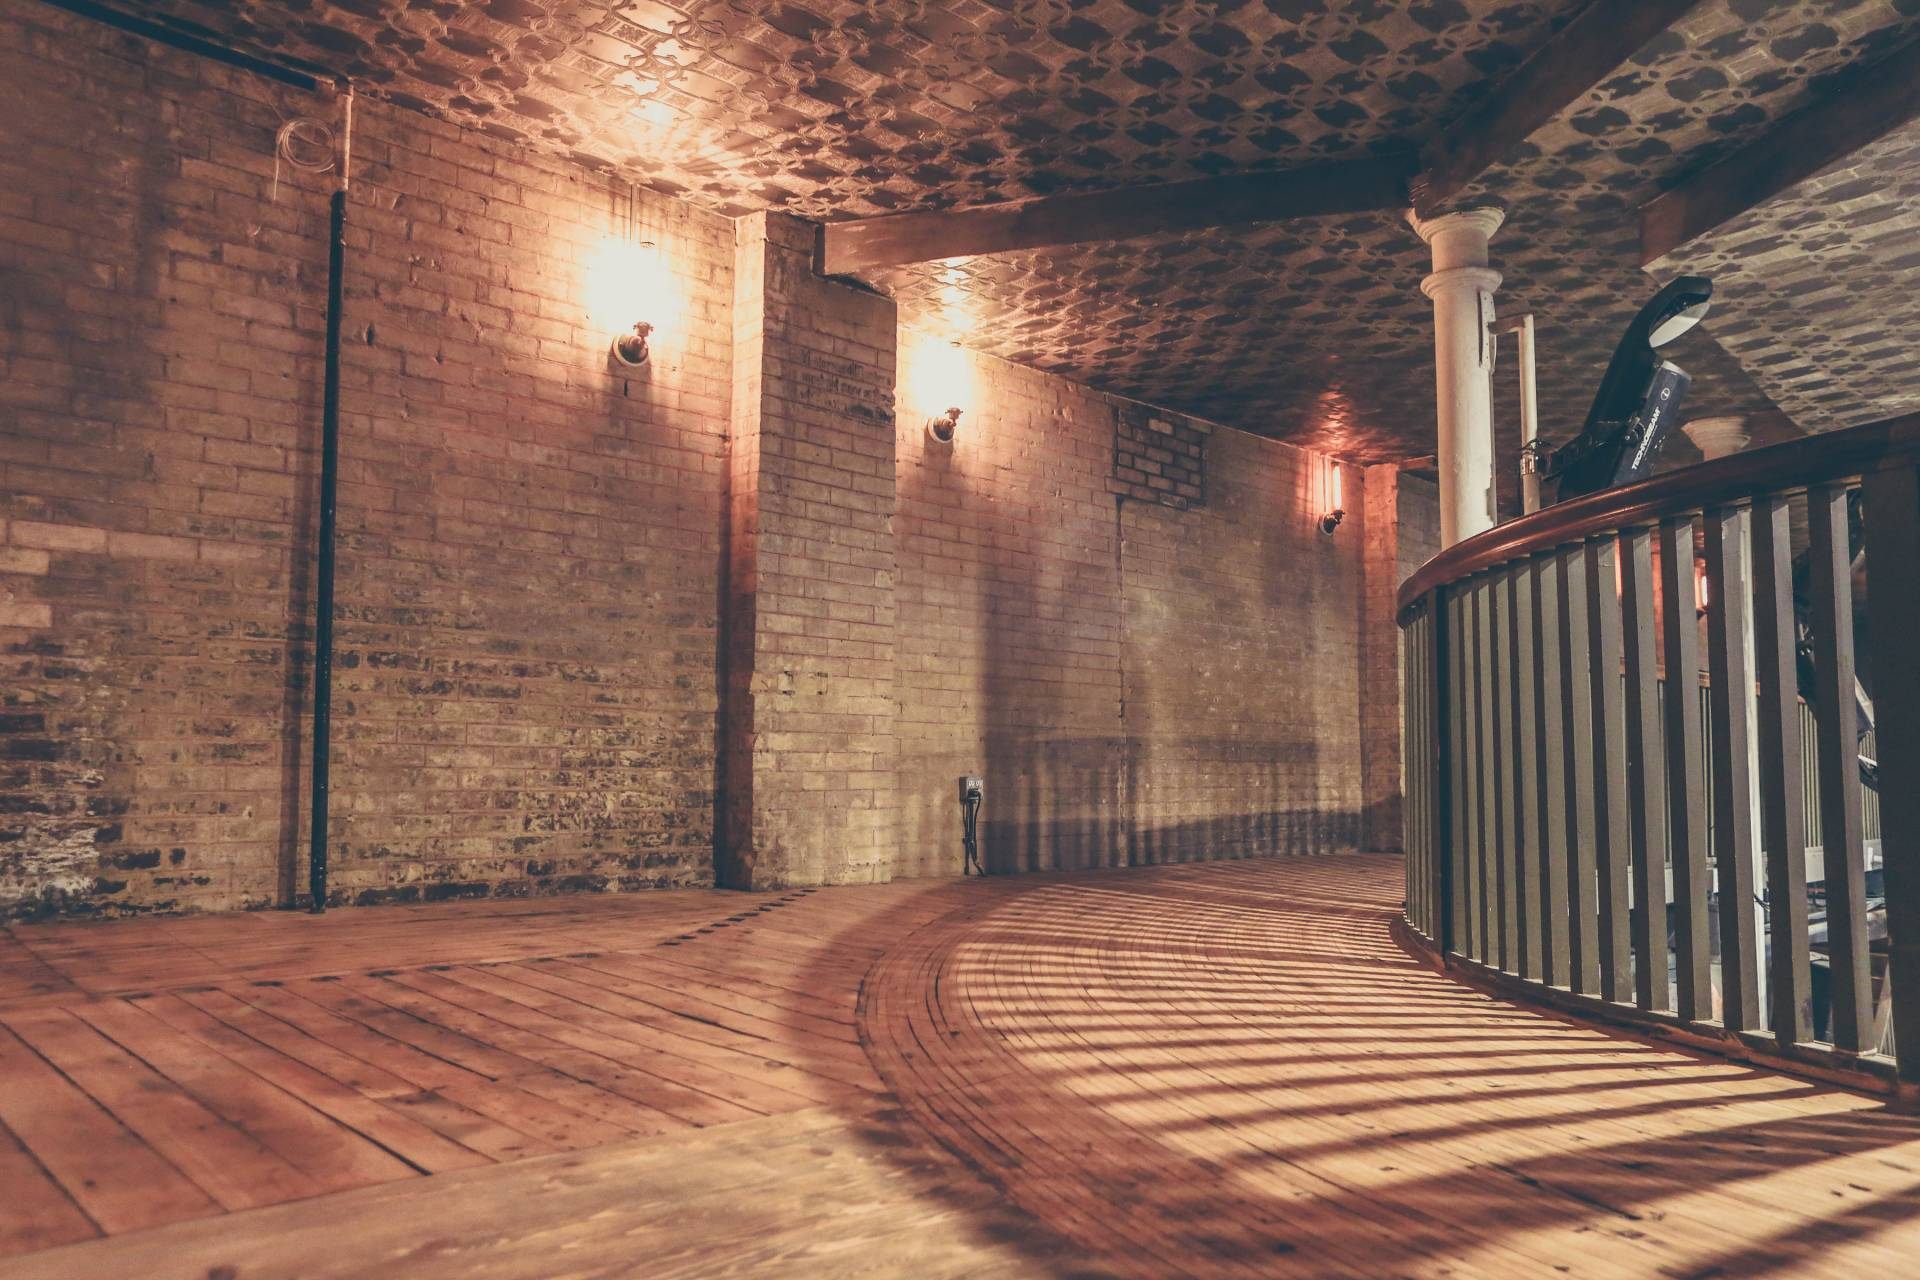 Brickwalls with a rustic hardwood floor